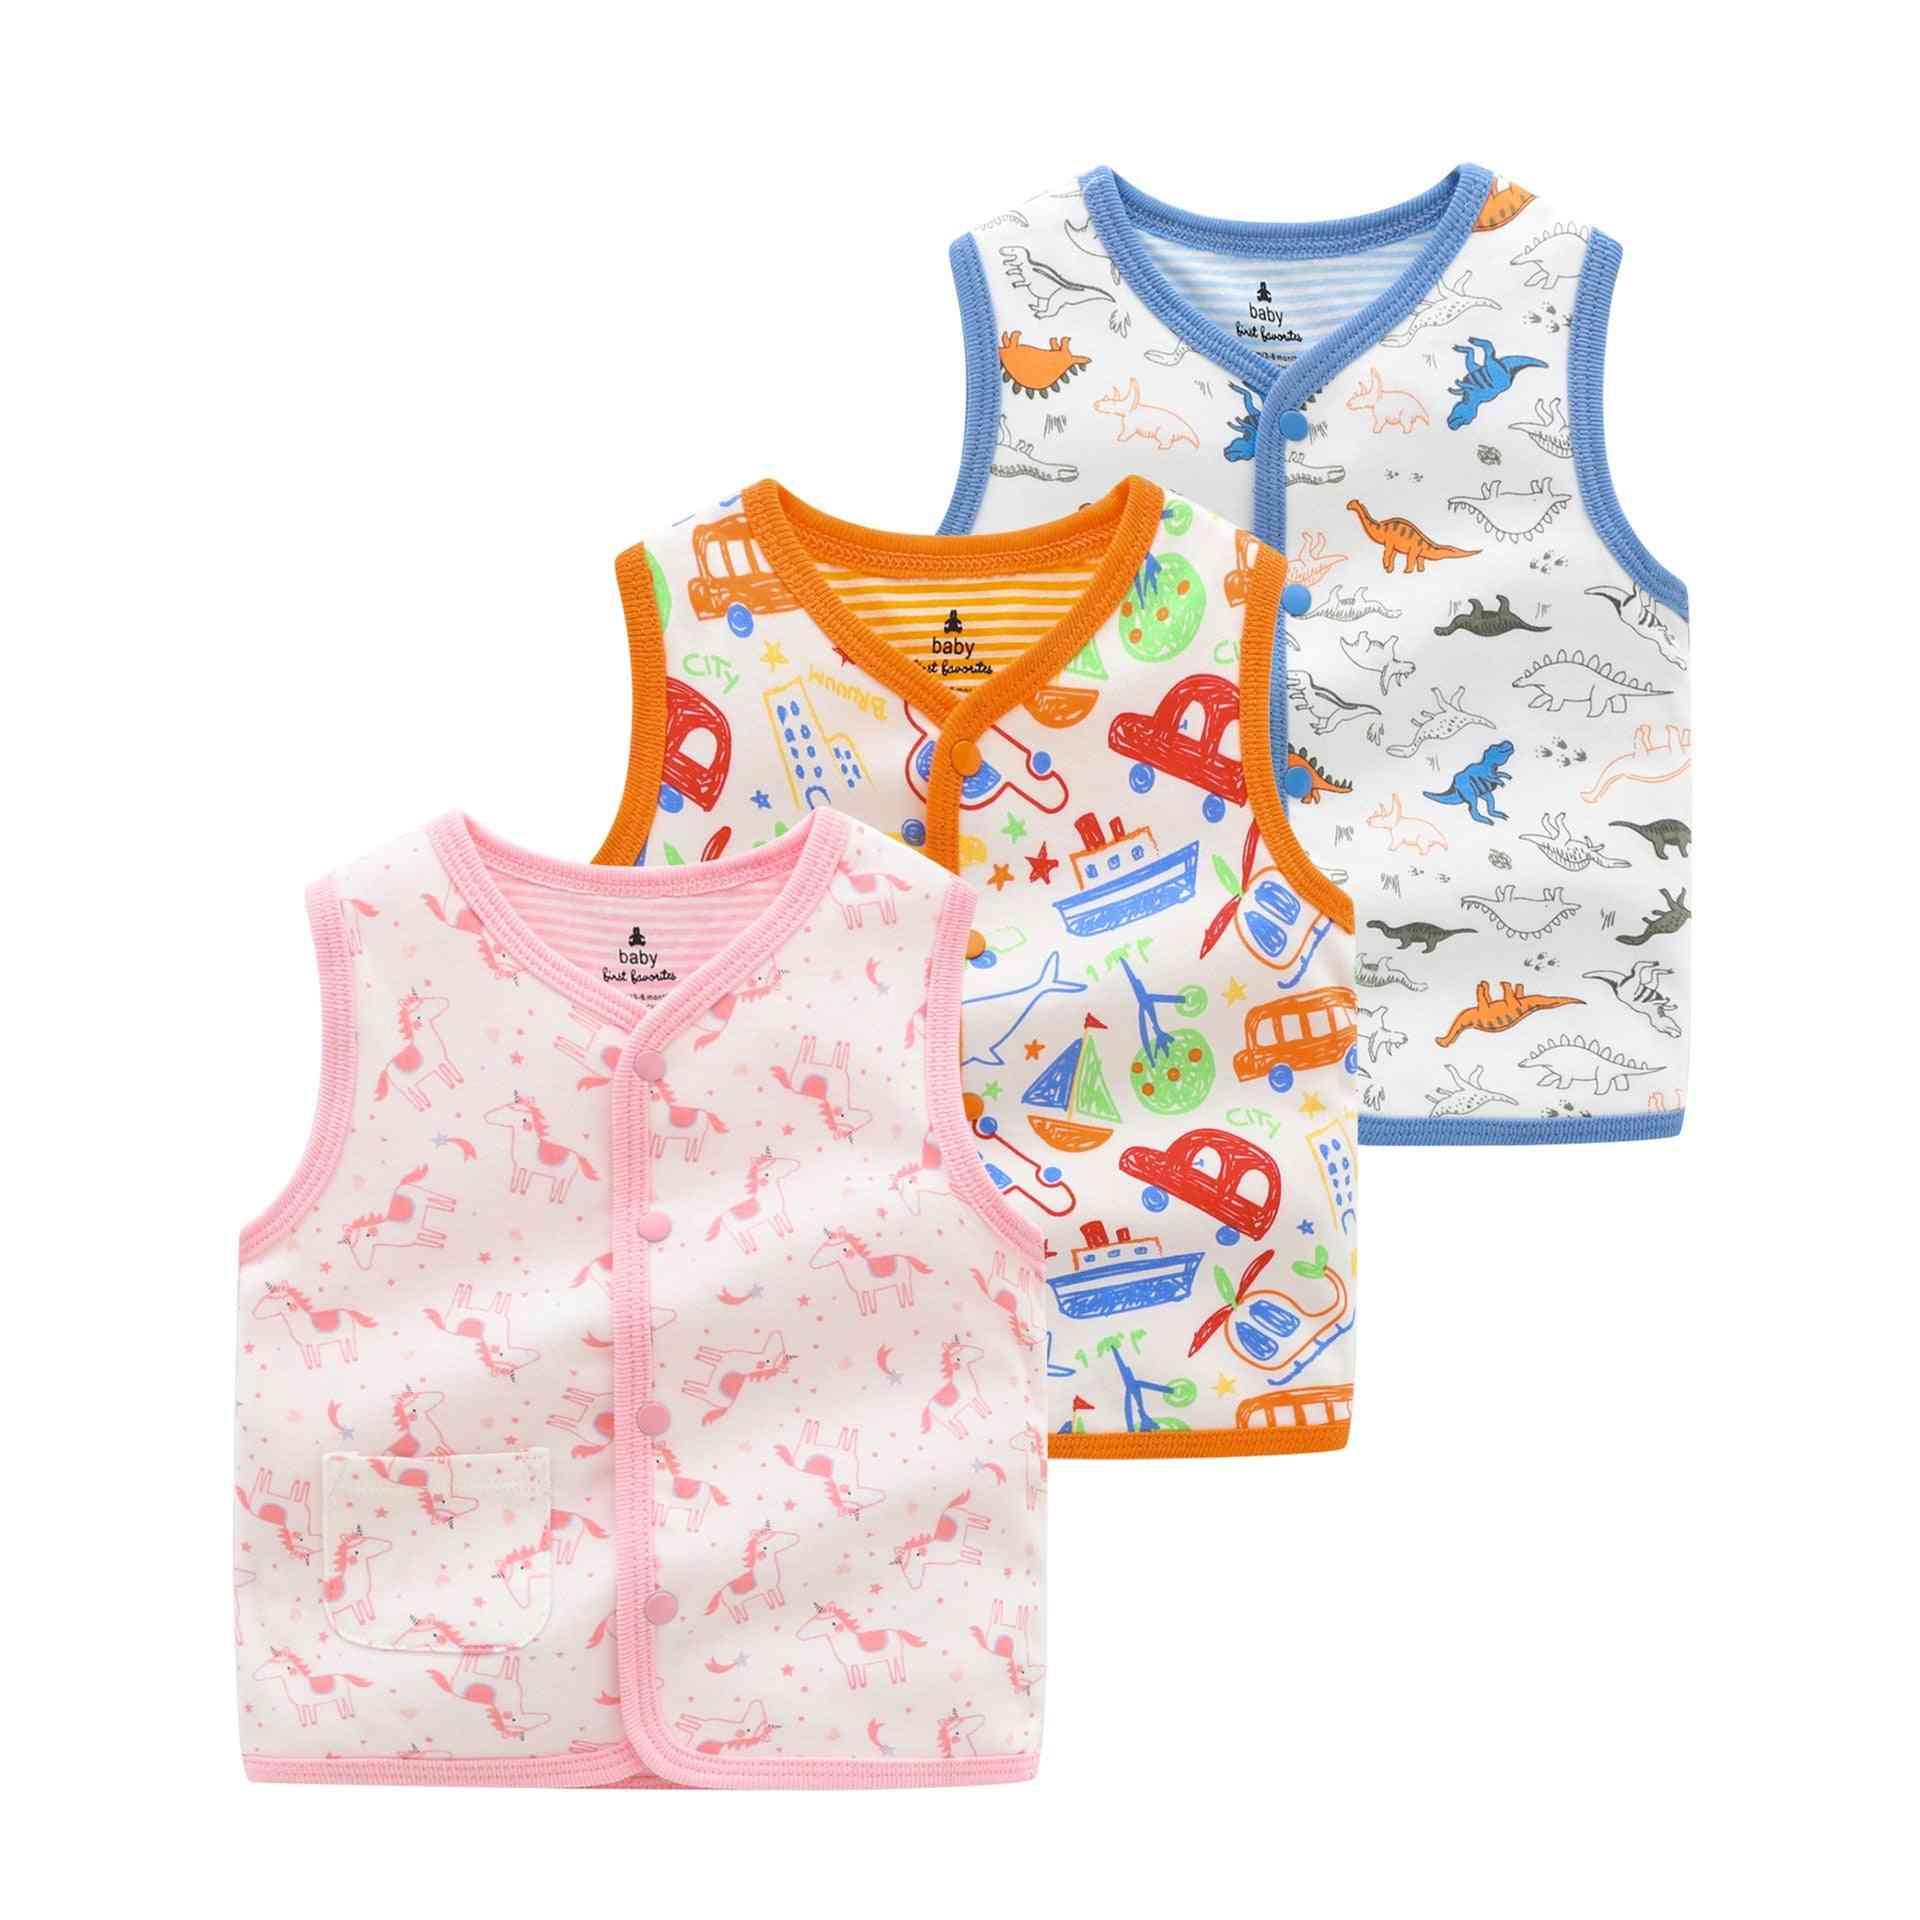 Cartoon Printed, Baby Cotton Vests-warm Outerwear